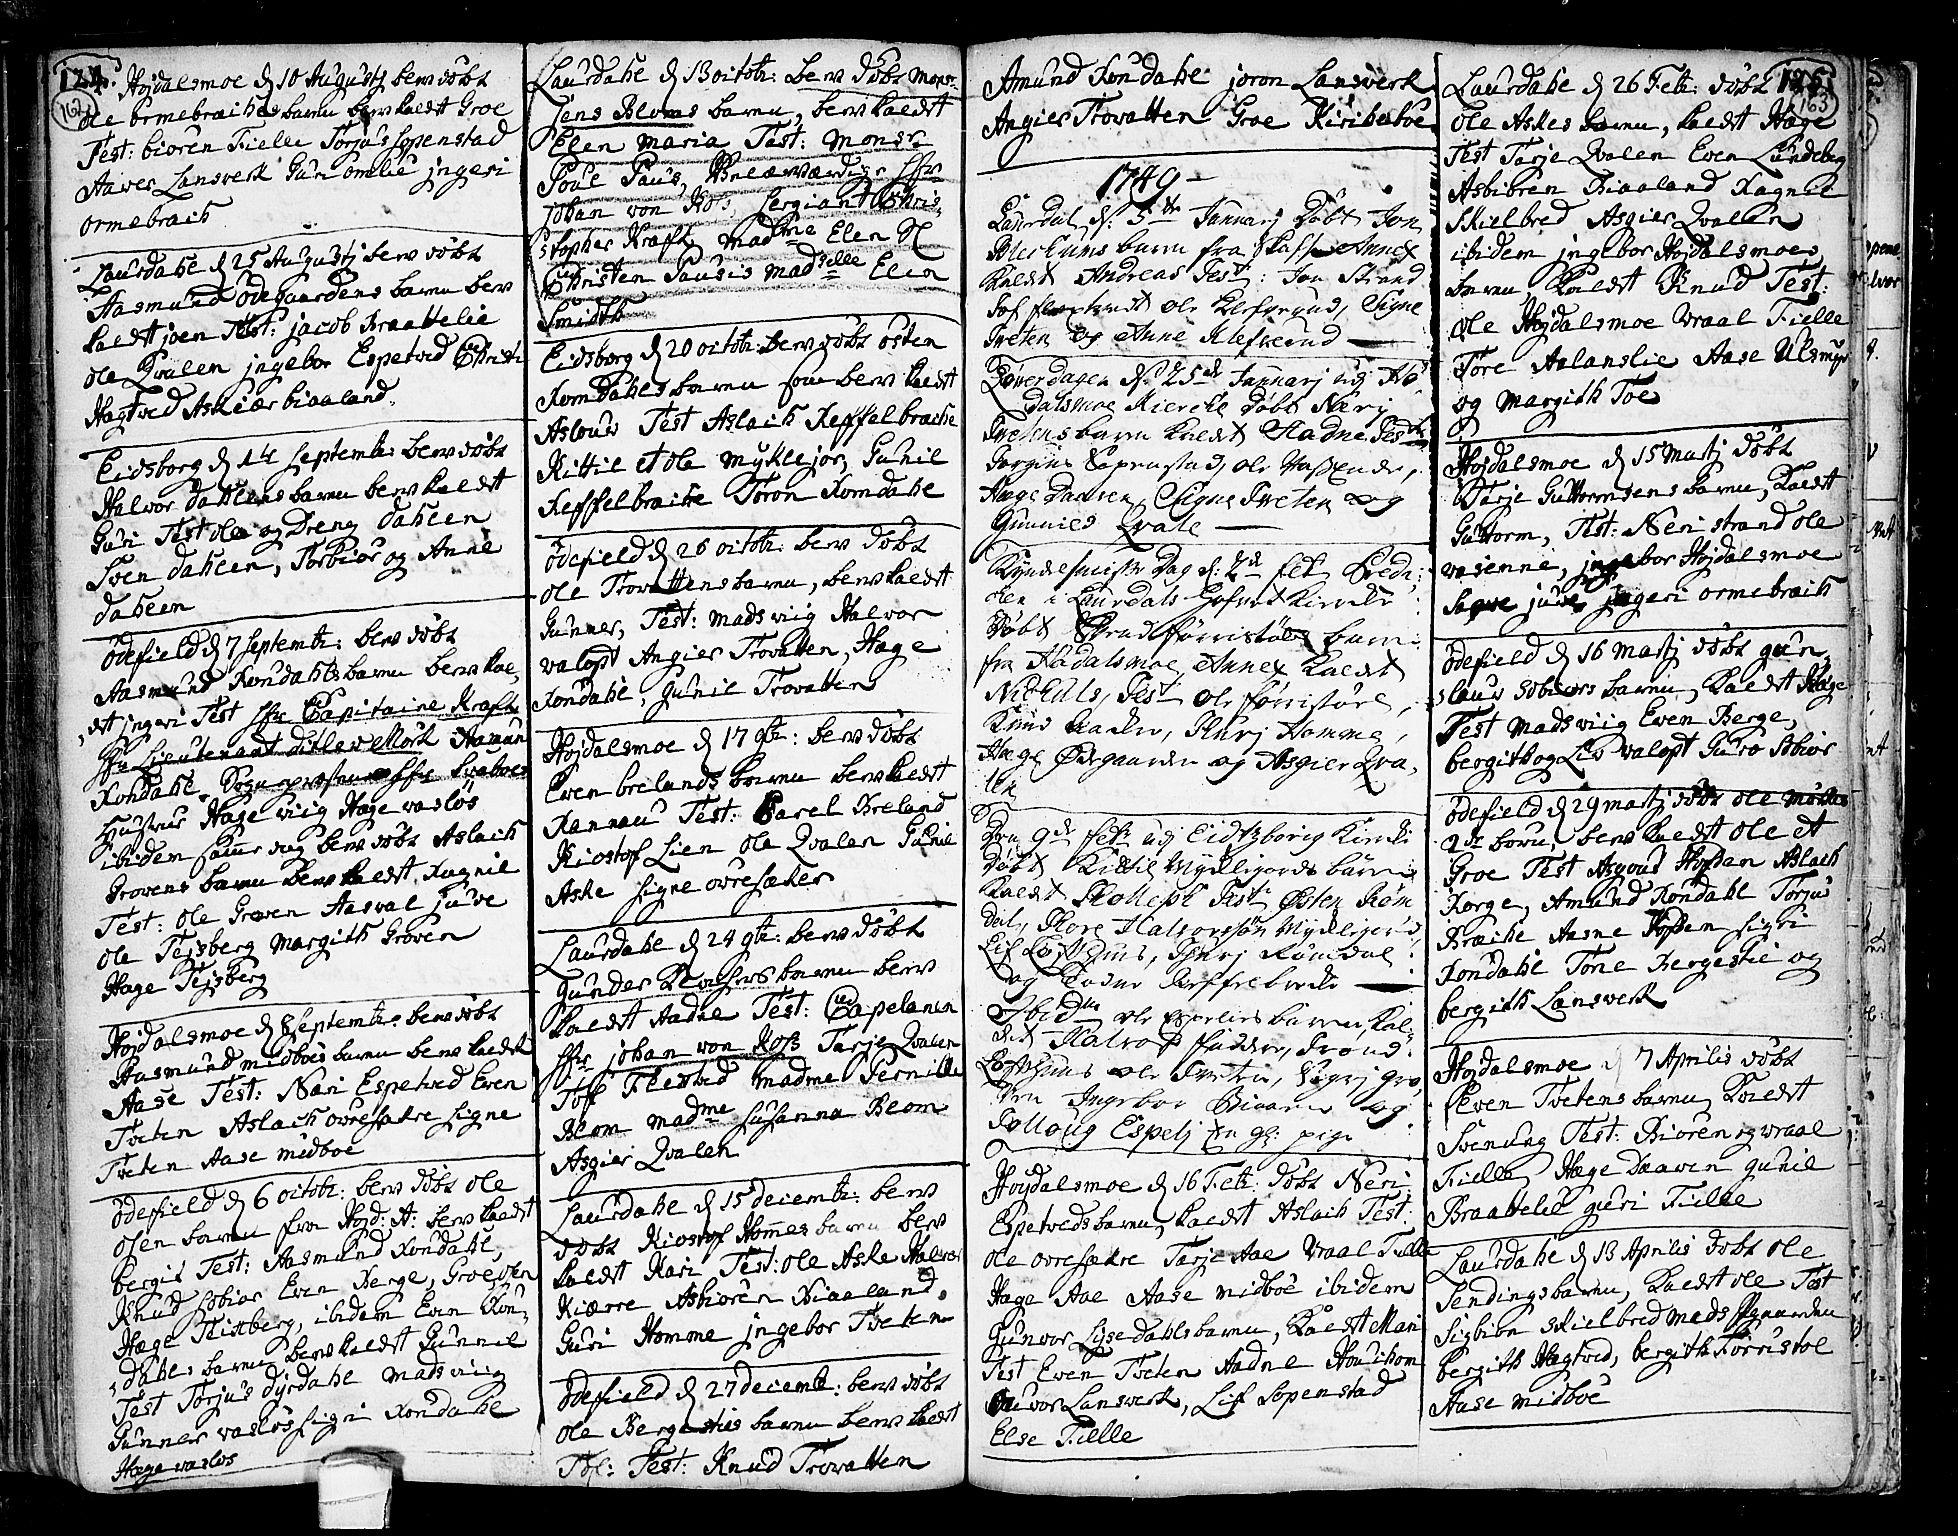 SAKO, Lårdal kirkebøker, F/Fa/L0002: Parish register (official) no. I 2, 1734-1754, p. 162-163